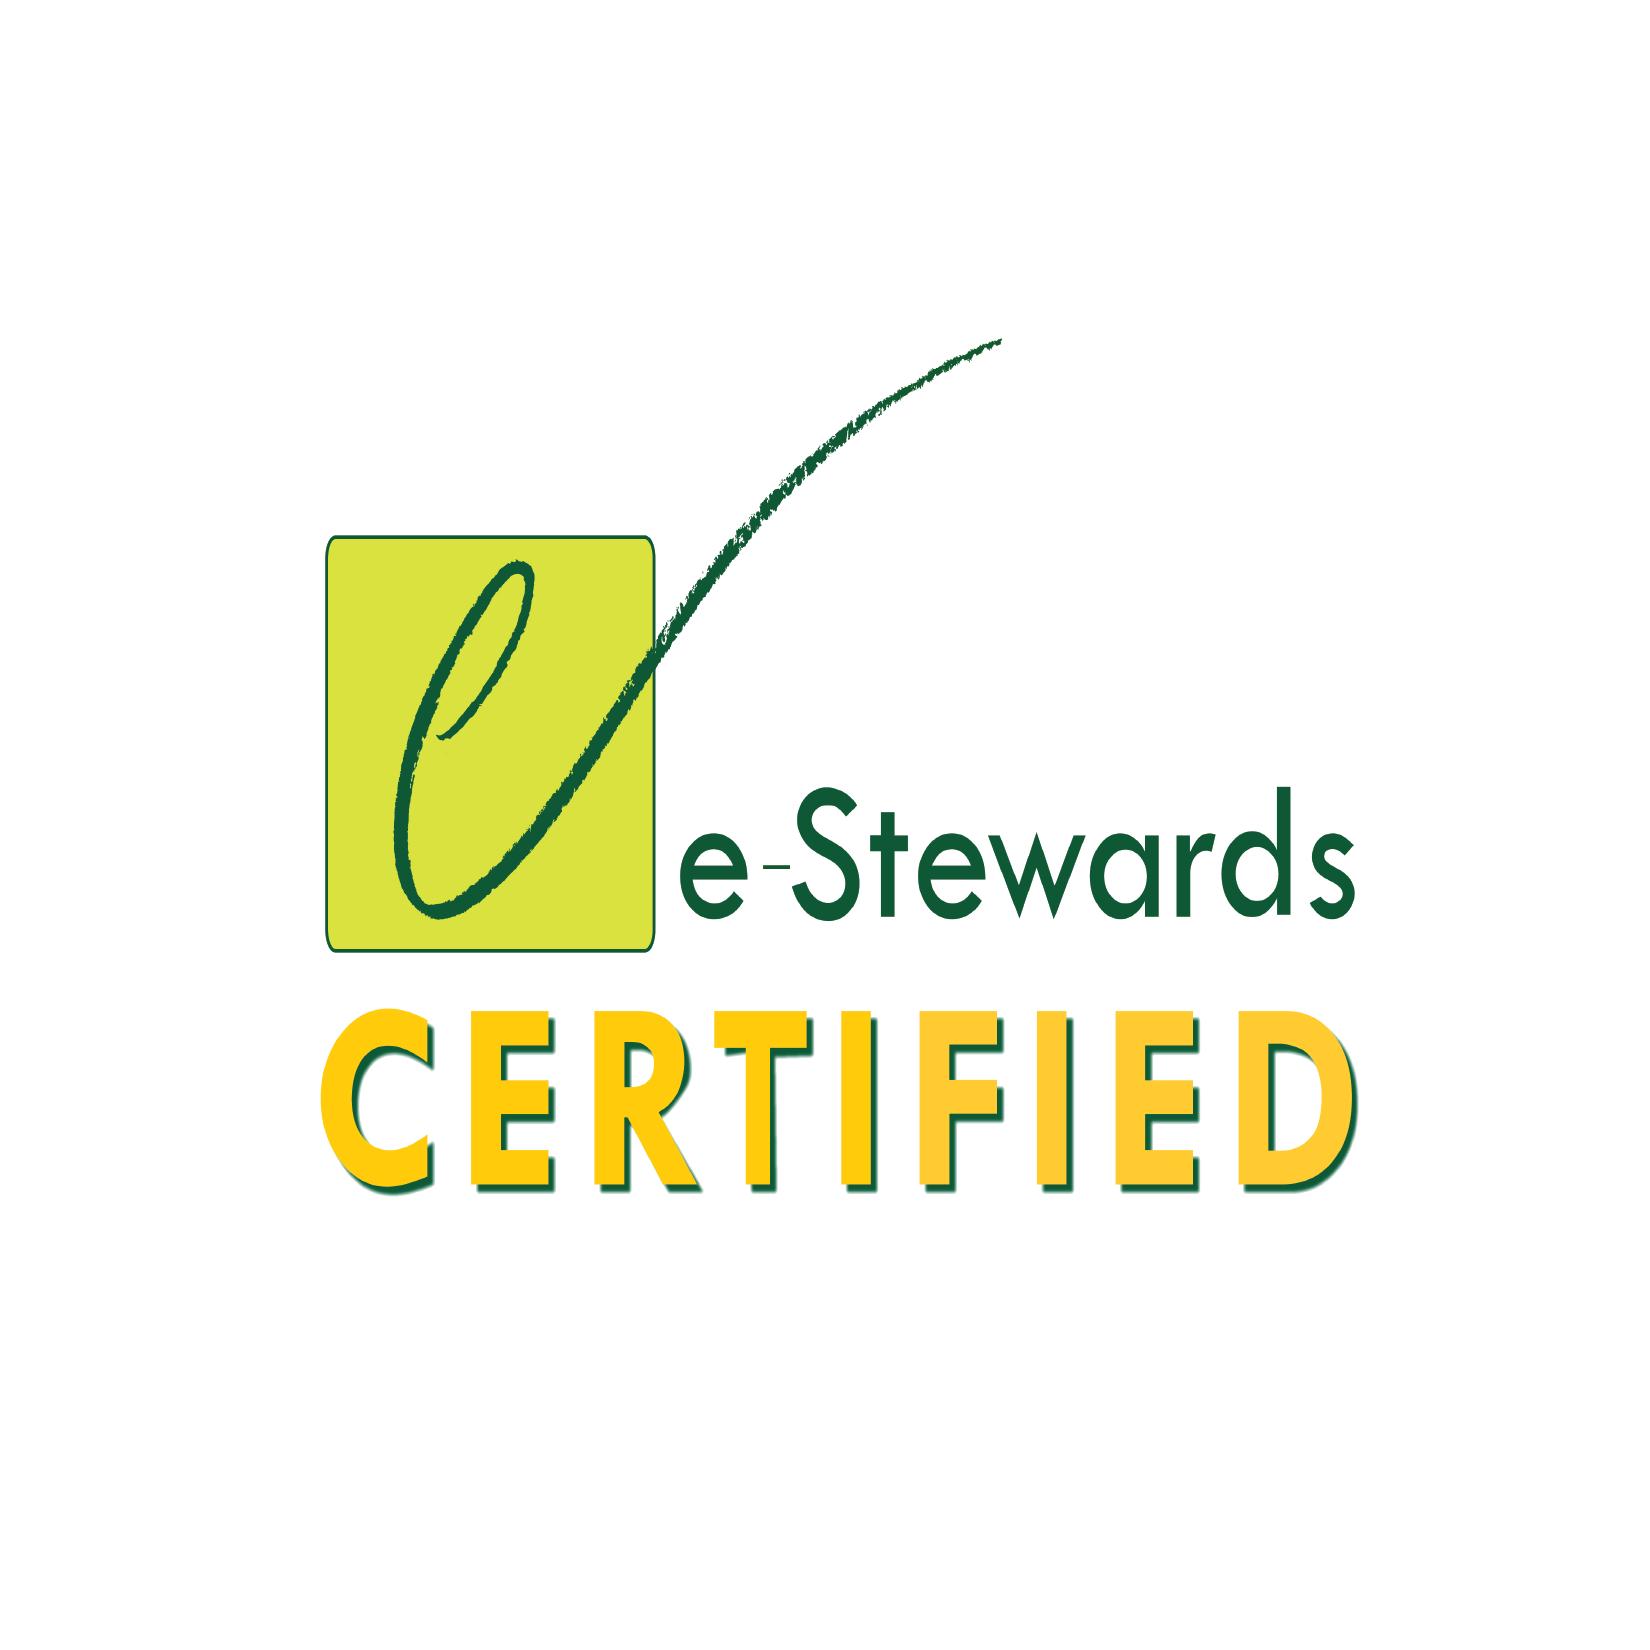 e-Steward Certification